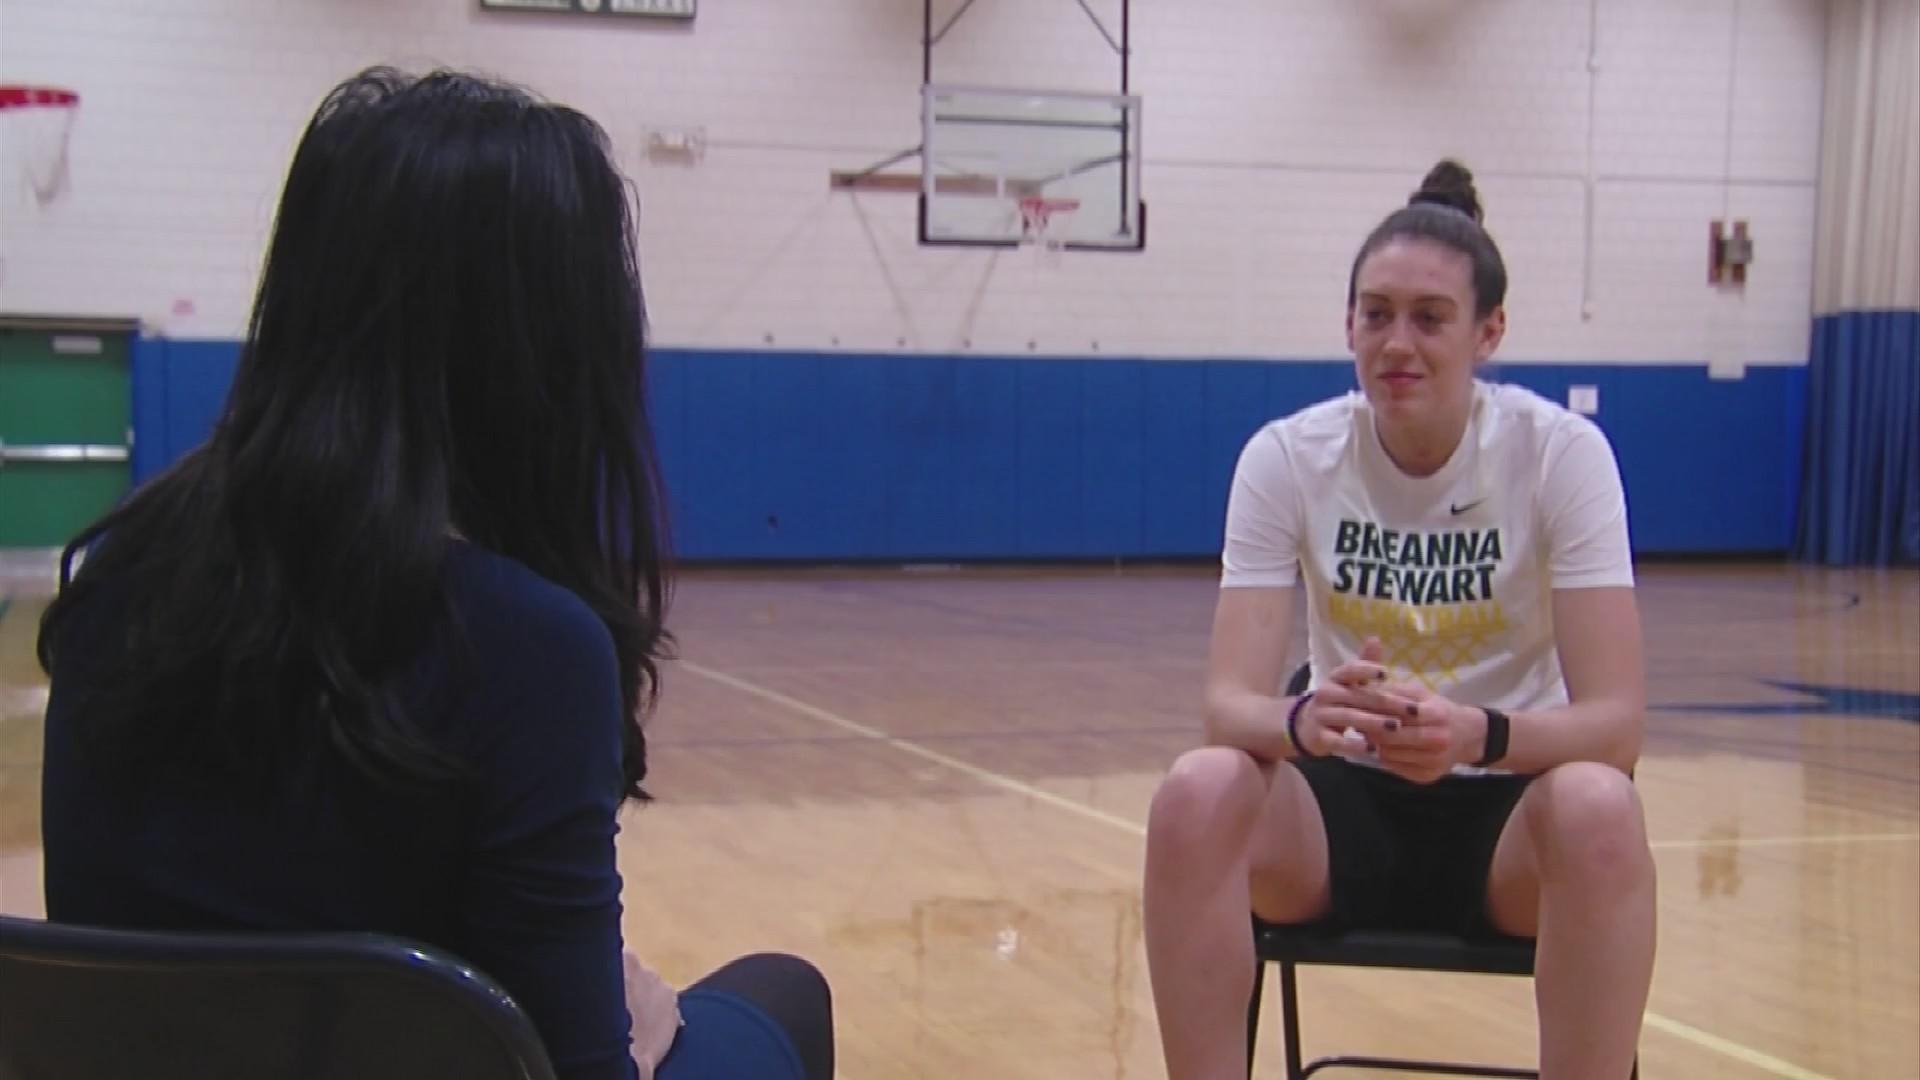 VIDEO: WNBA star, Olympic gold medalist Breanna Stewart aiming beyond arc to impact world